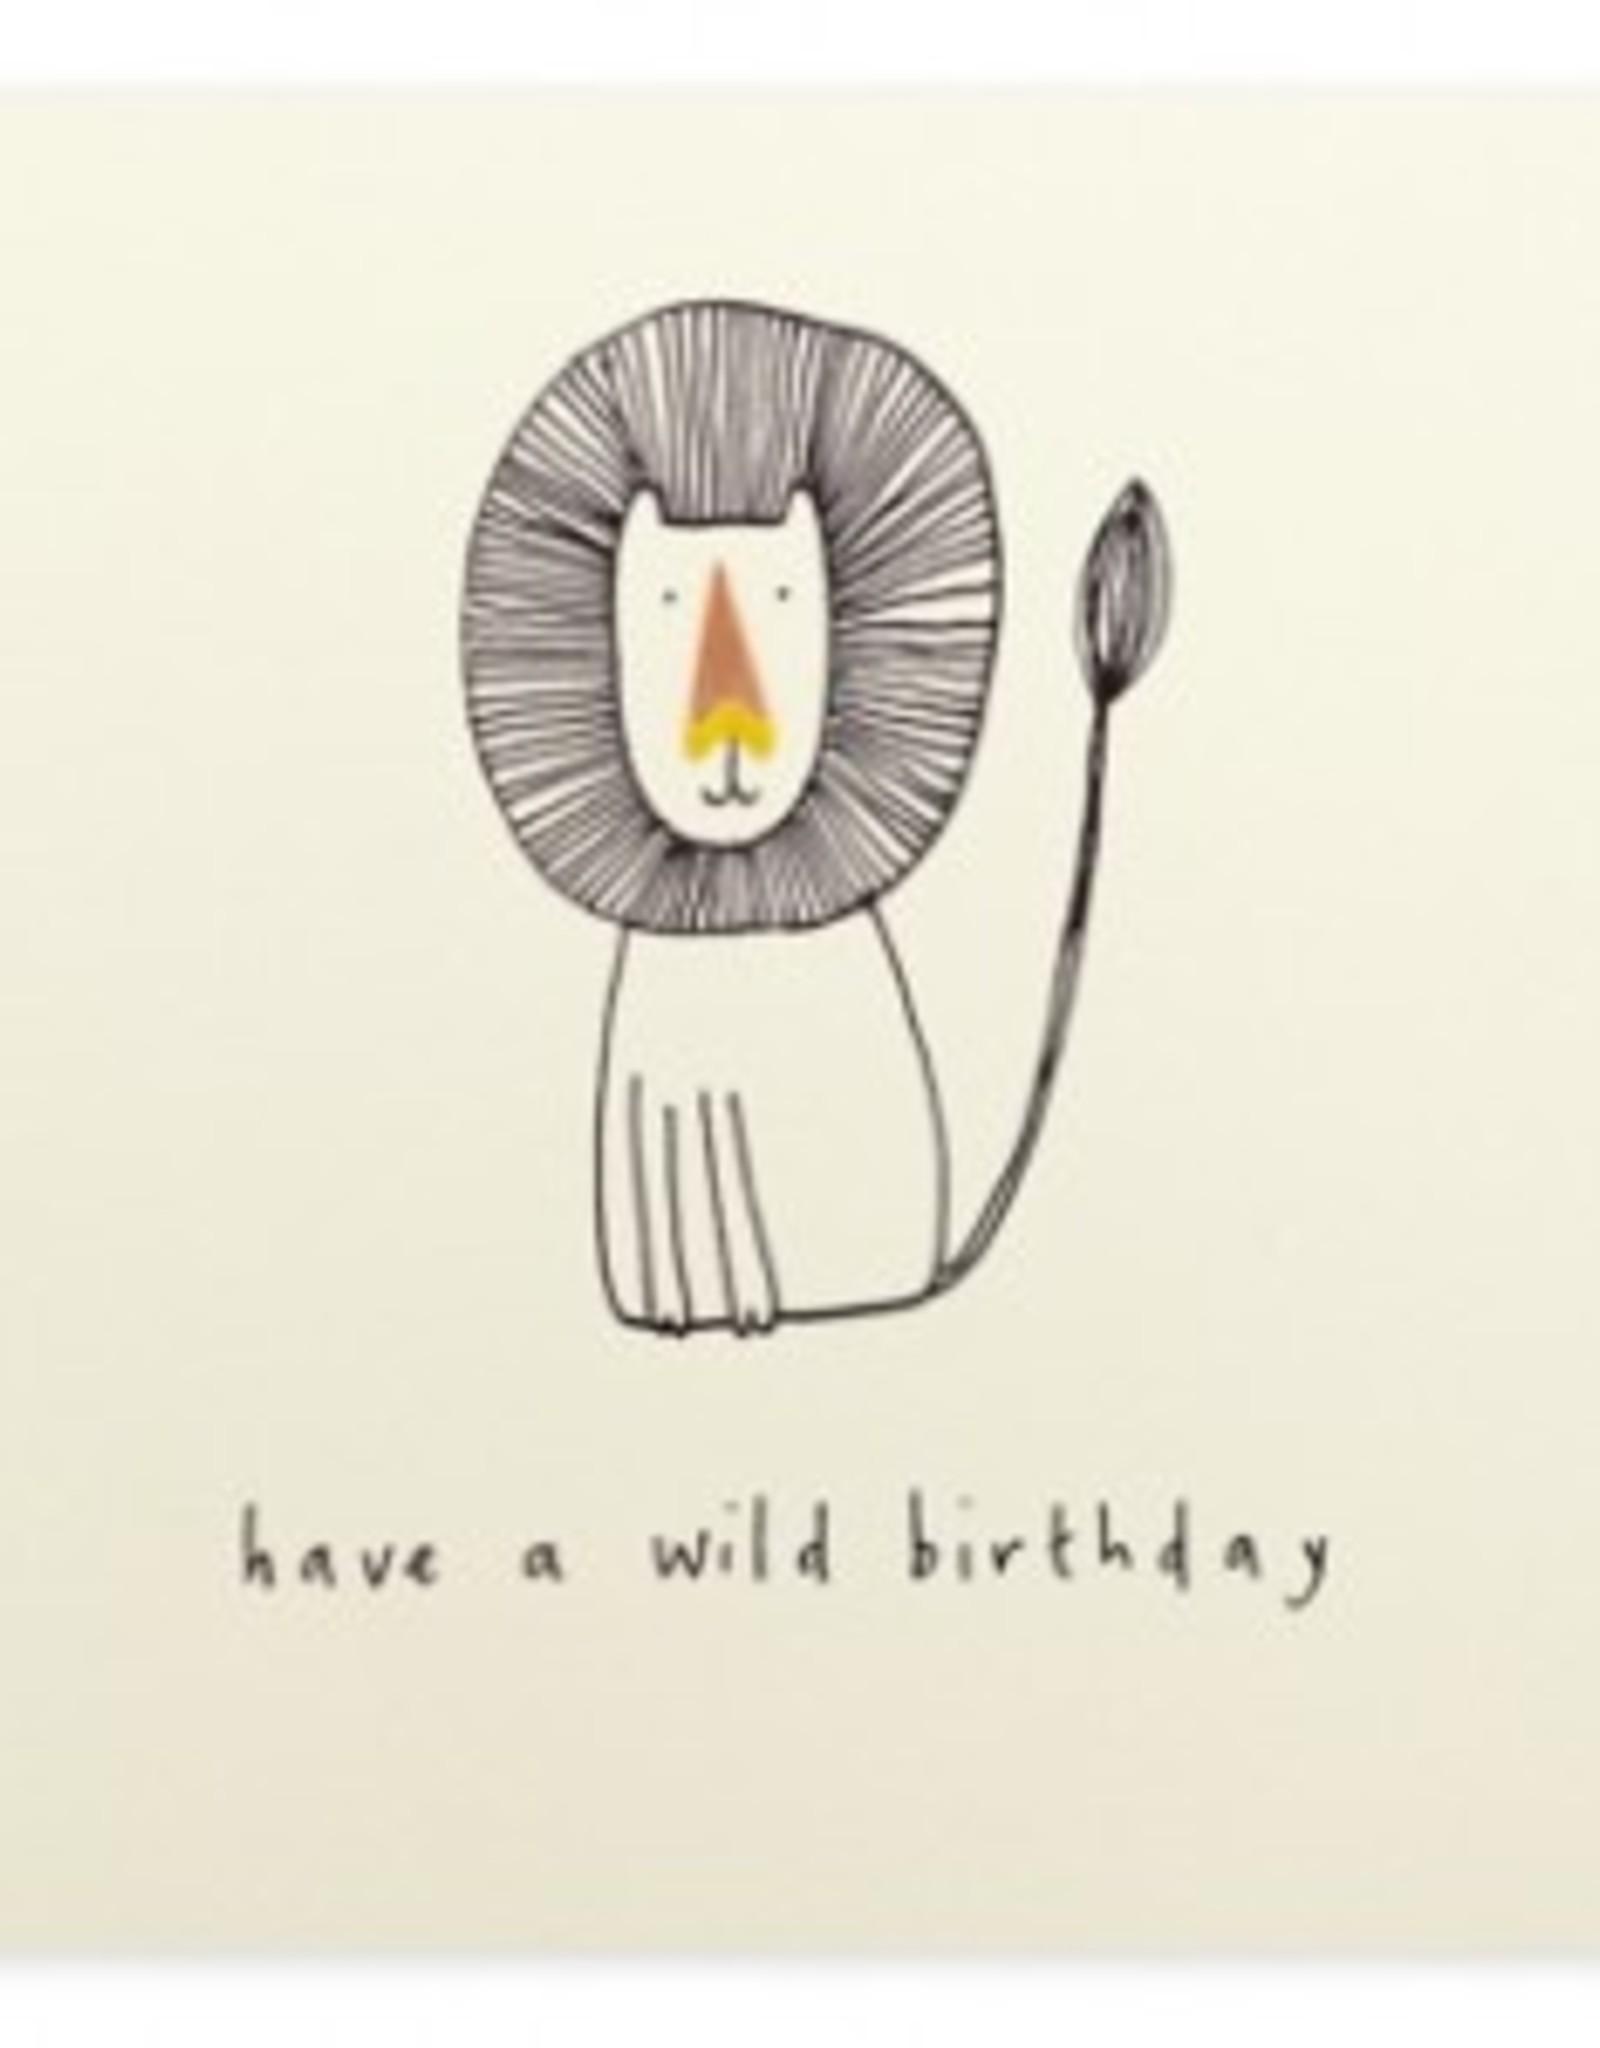 Ruth Jackson Have a wild birthday (lion)